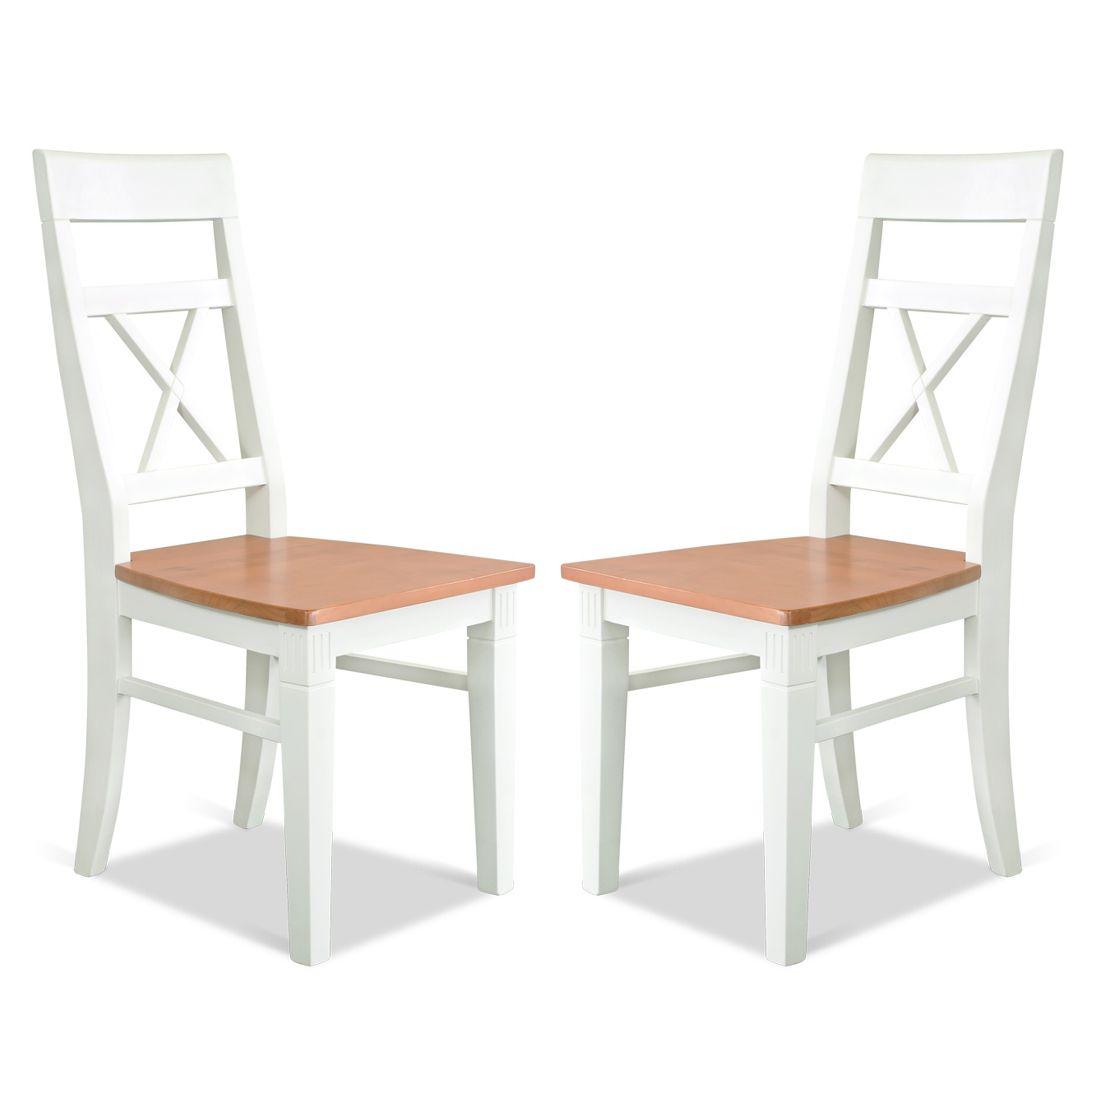 Weiße Holz Küche Stuhl | Stühle | Pinterest | Hampton beach, Rustic ...